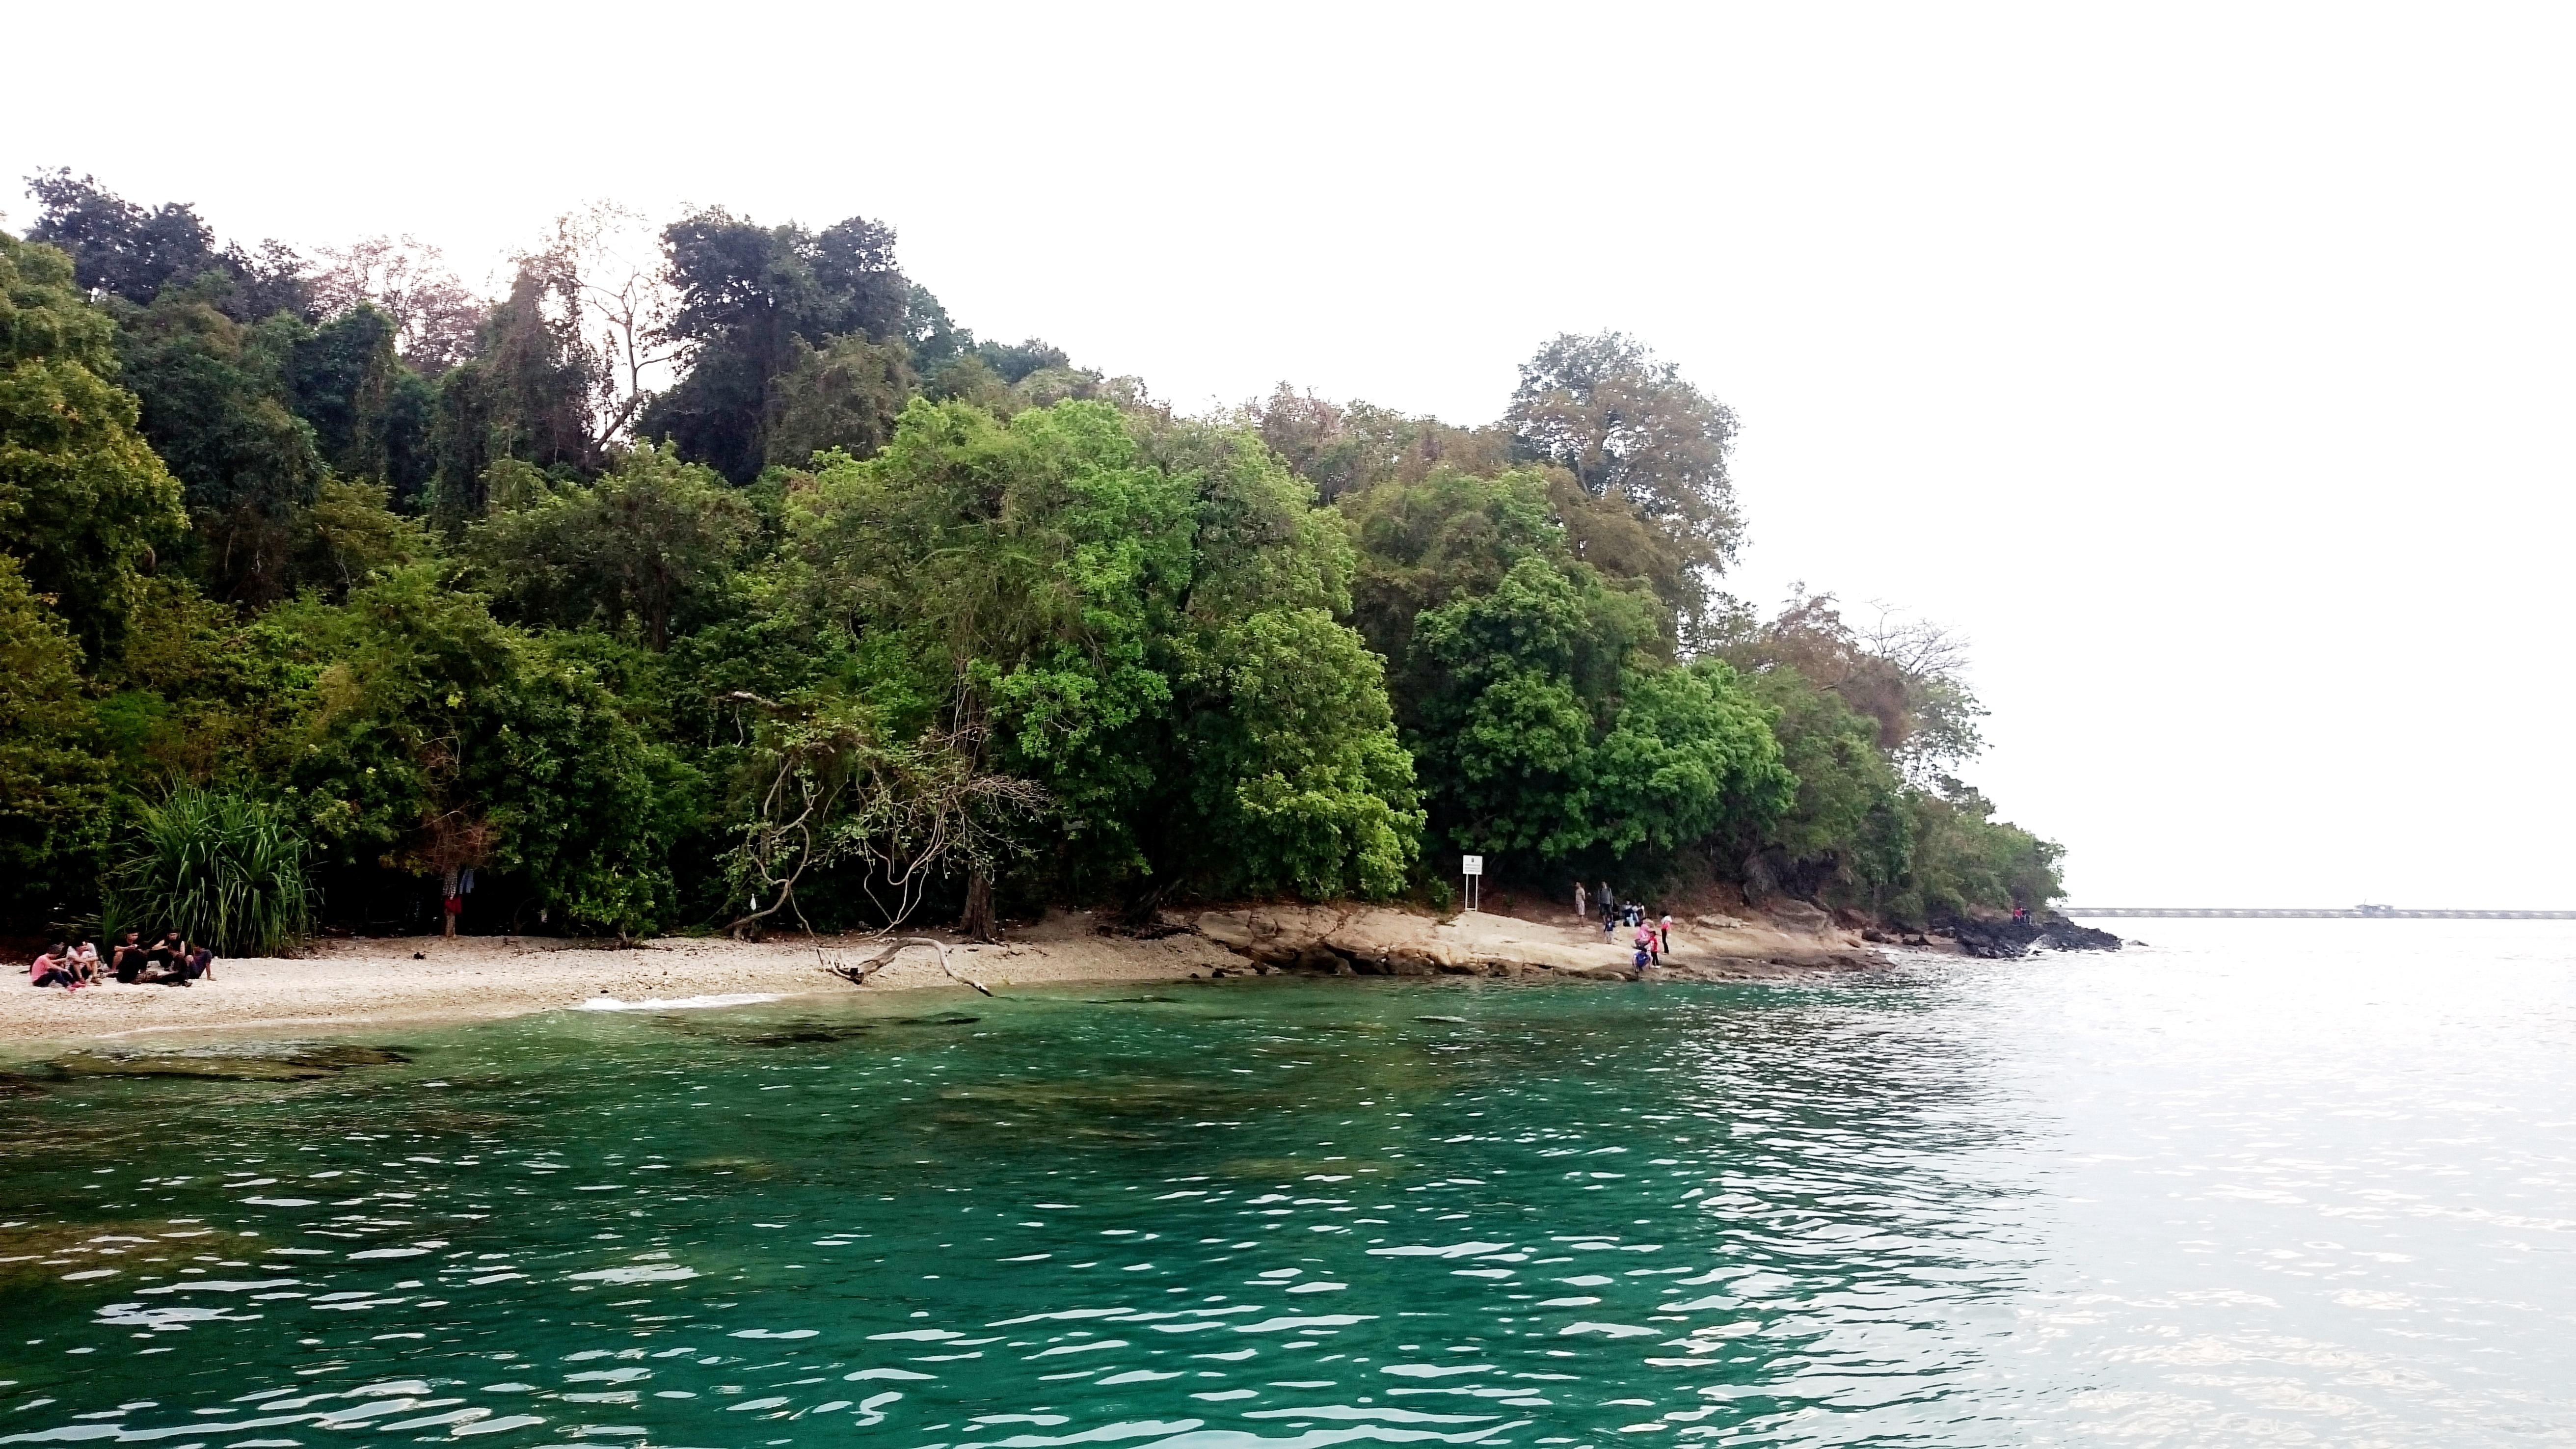 Destinasi Indonesia Wisata Pulau Banten Kecil Terletak Bibir Jawa Pinggir